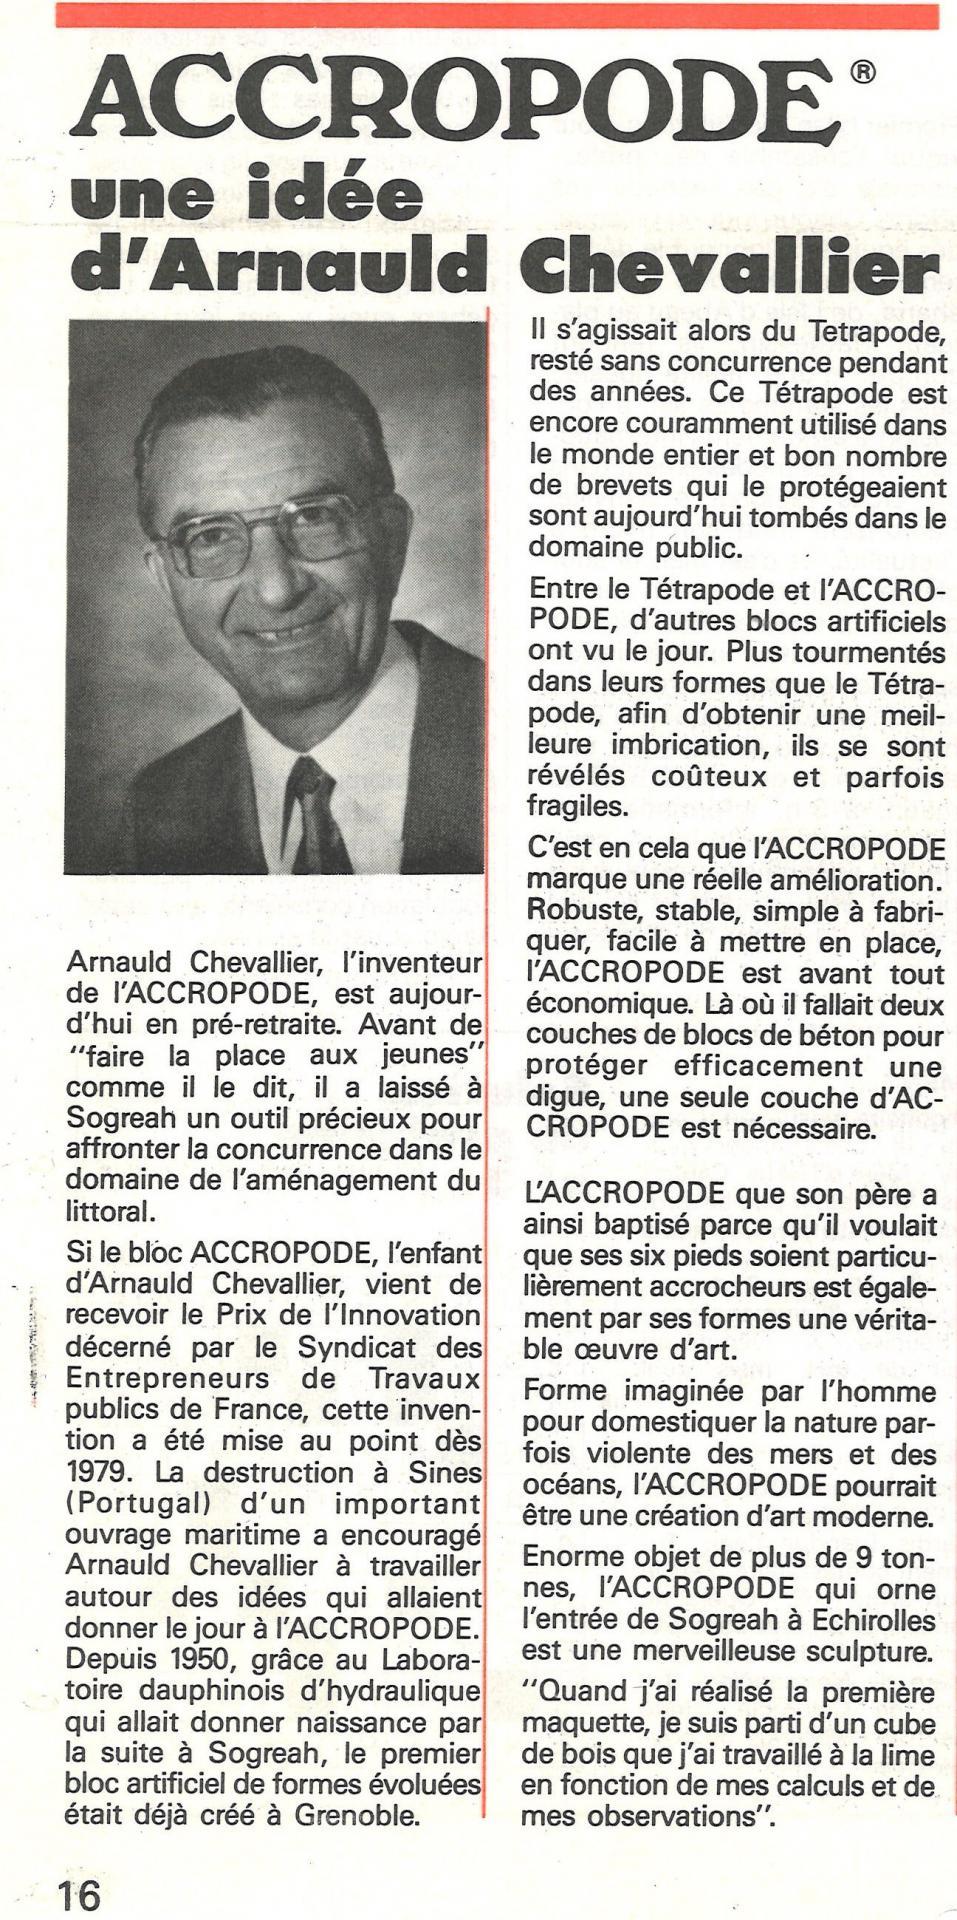 1983 arnauld chevallier accropode extrai arnauld